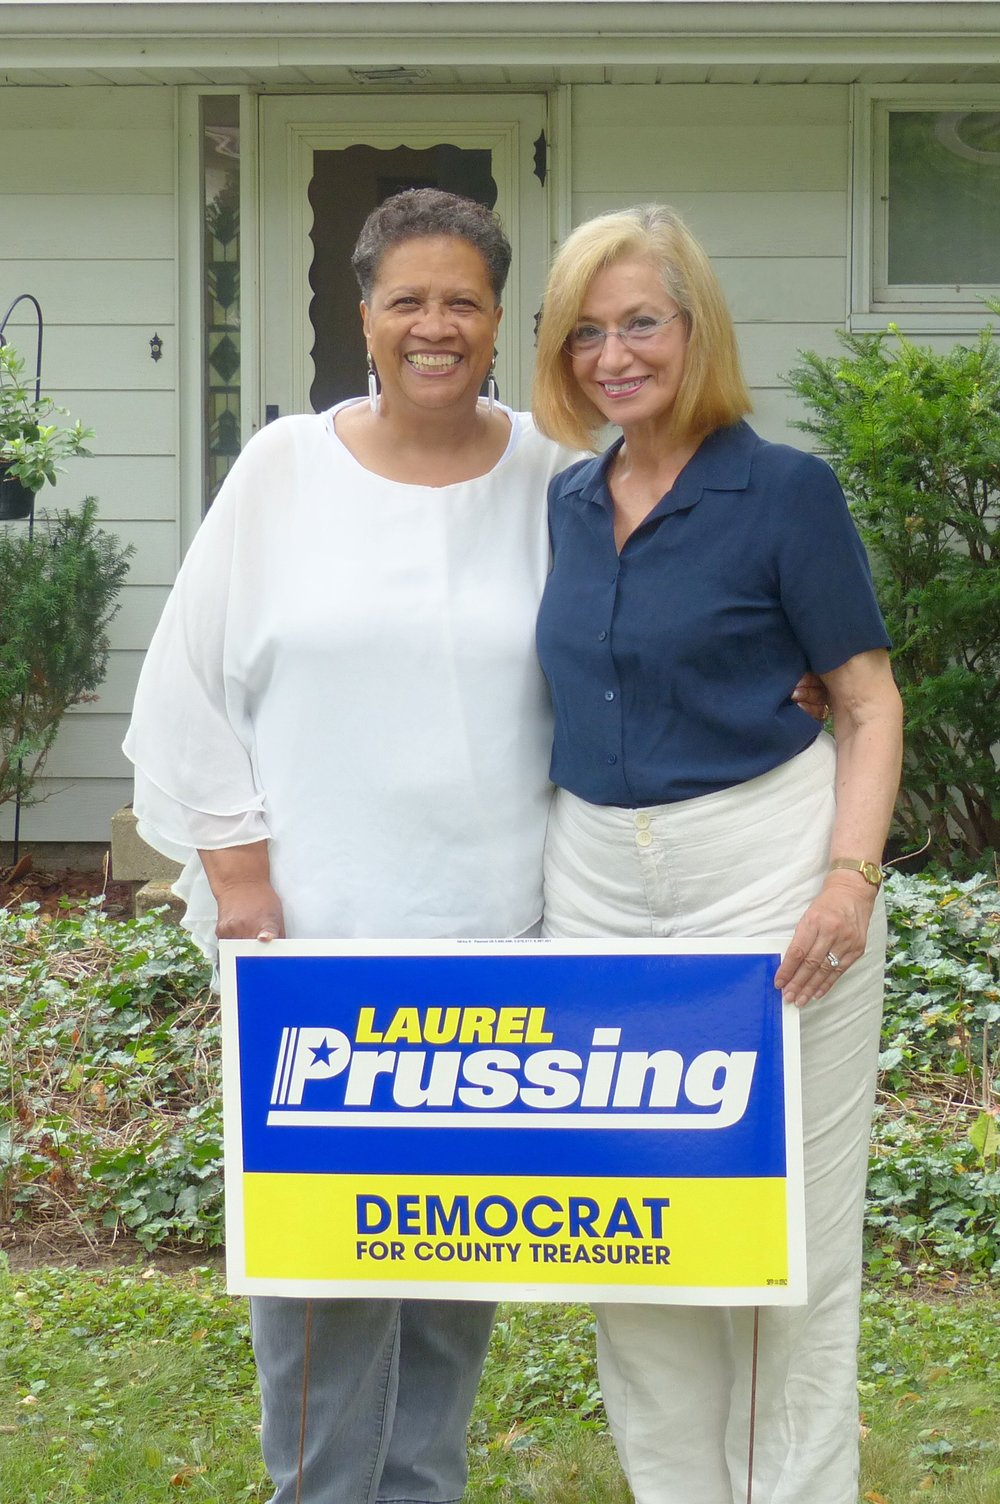 Phyllis D. Clark & Laurel Prussing